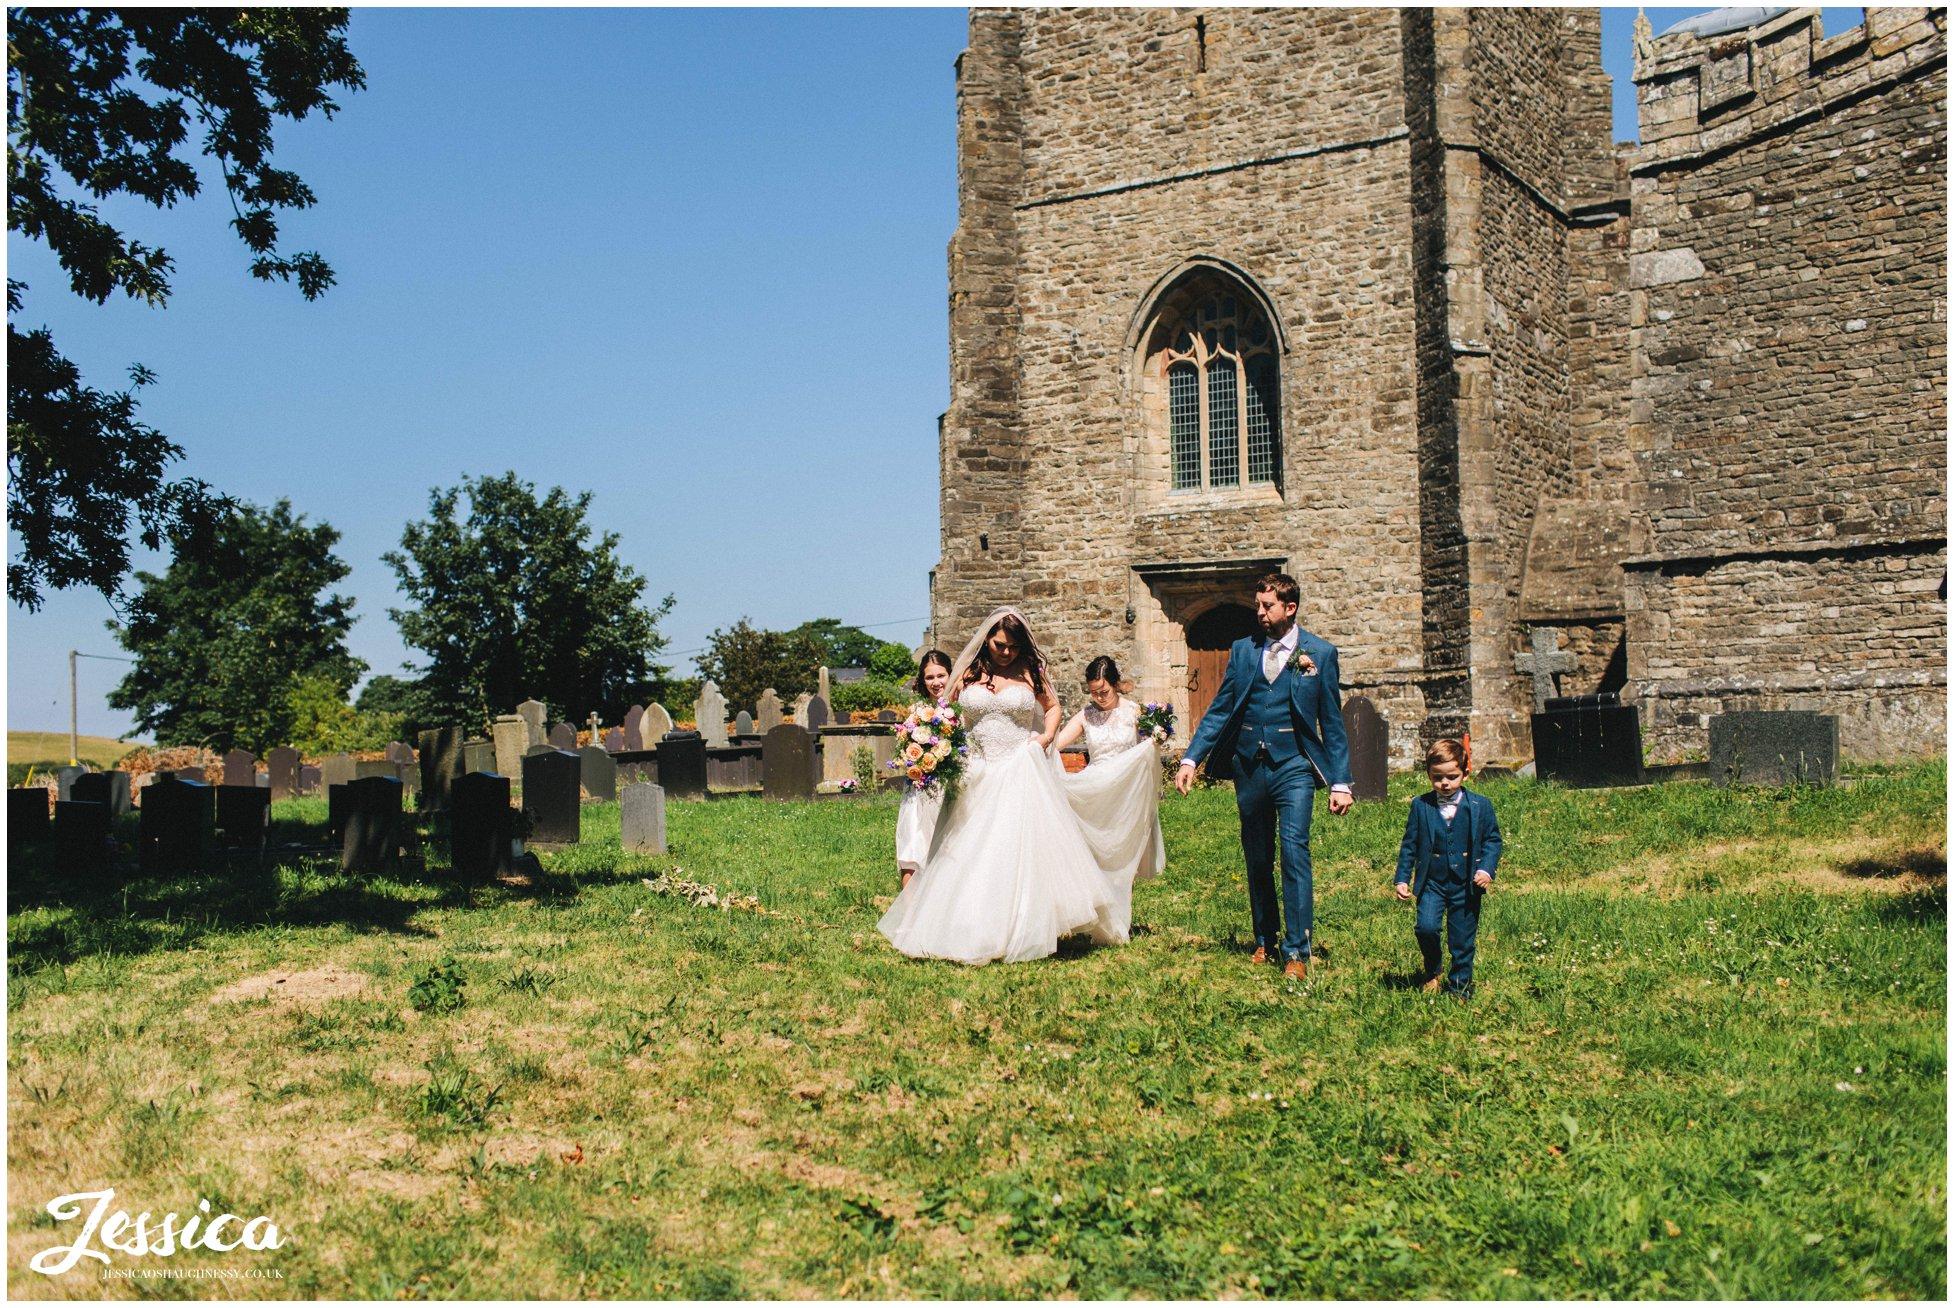 the new couple walk through the church grounds at st beuno's church in Caernarfon